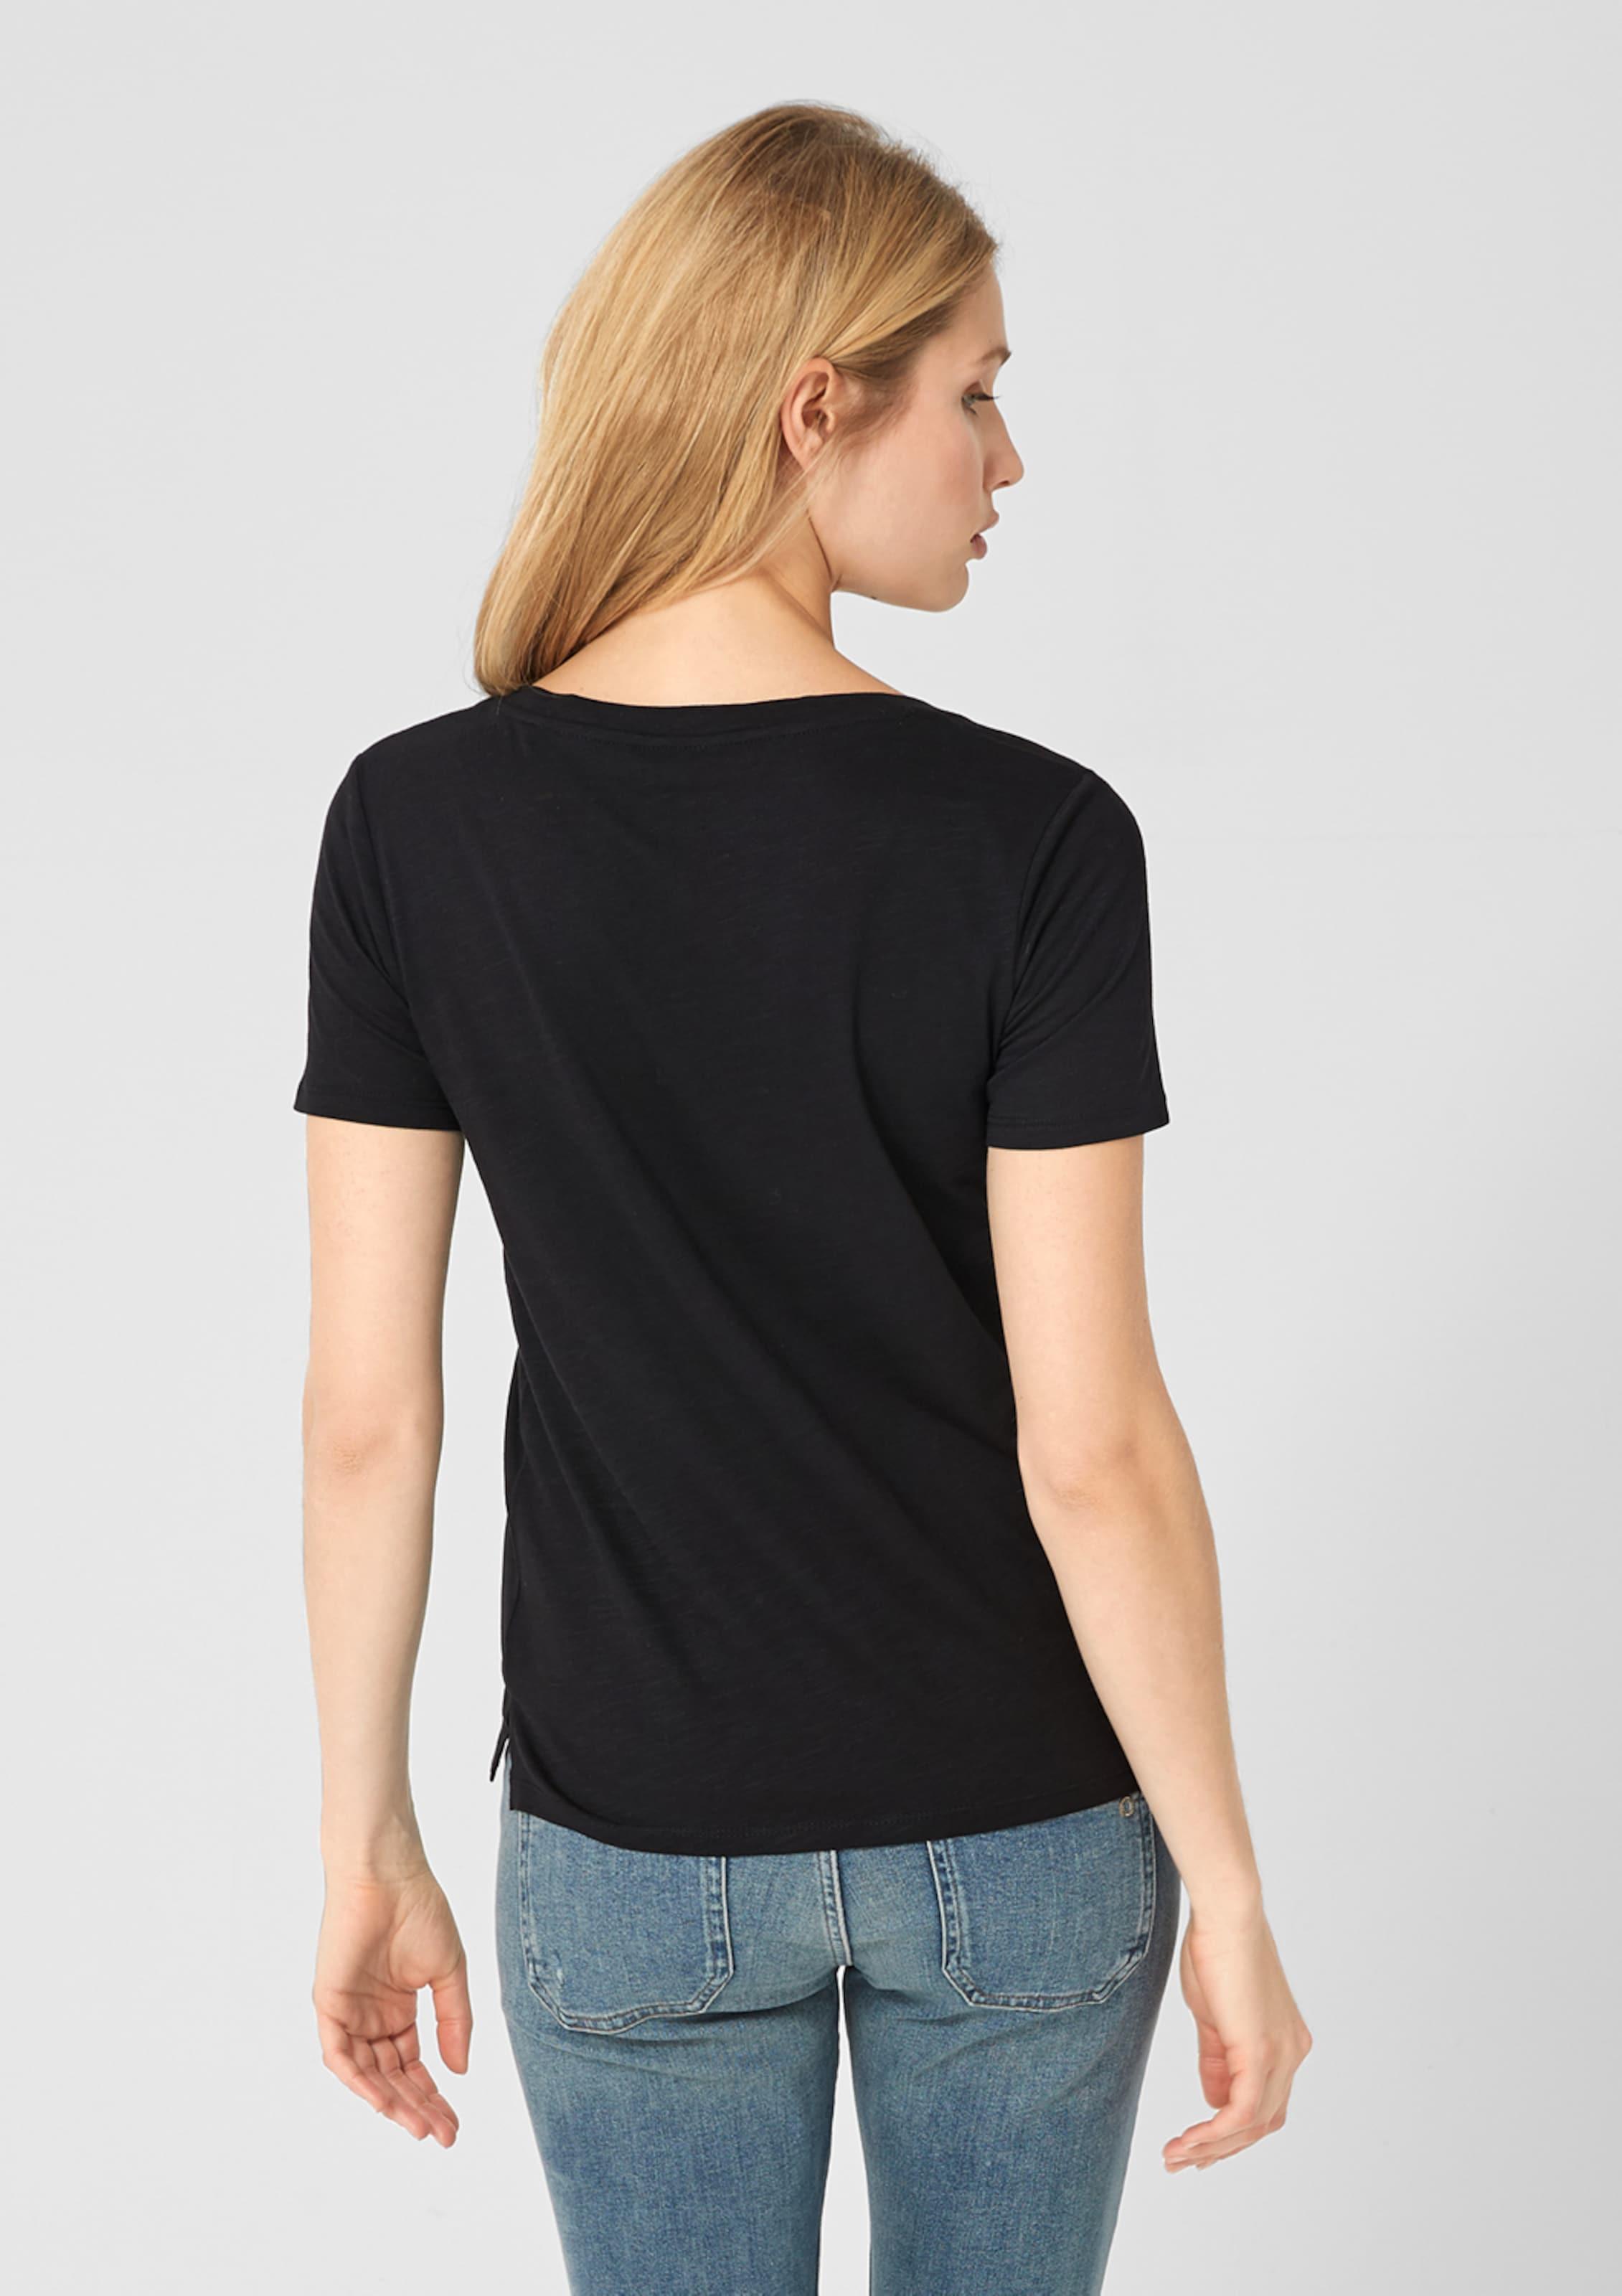 S S In Shirt In Schwarz S oliver Schwarz Shirt Shirt oliver oliver In D9IHW2E